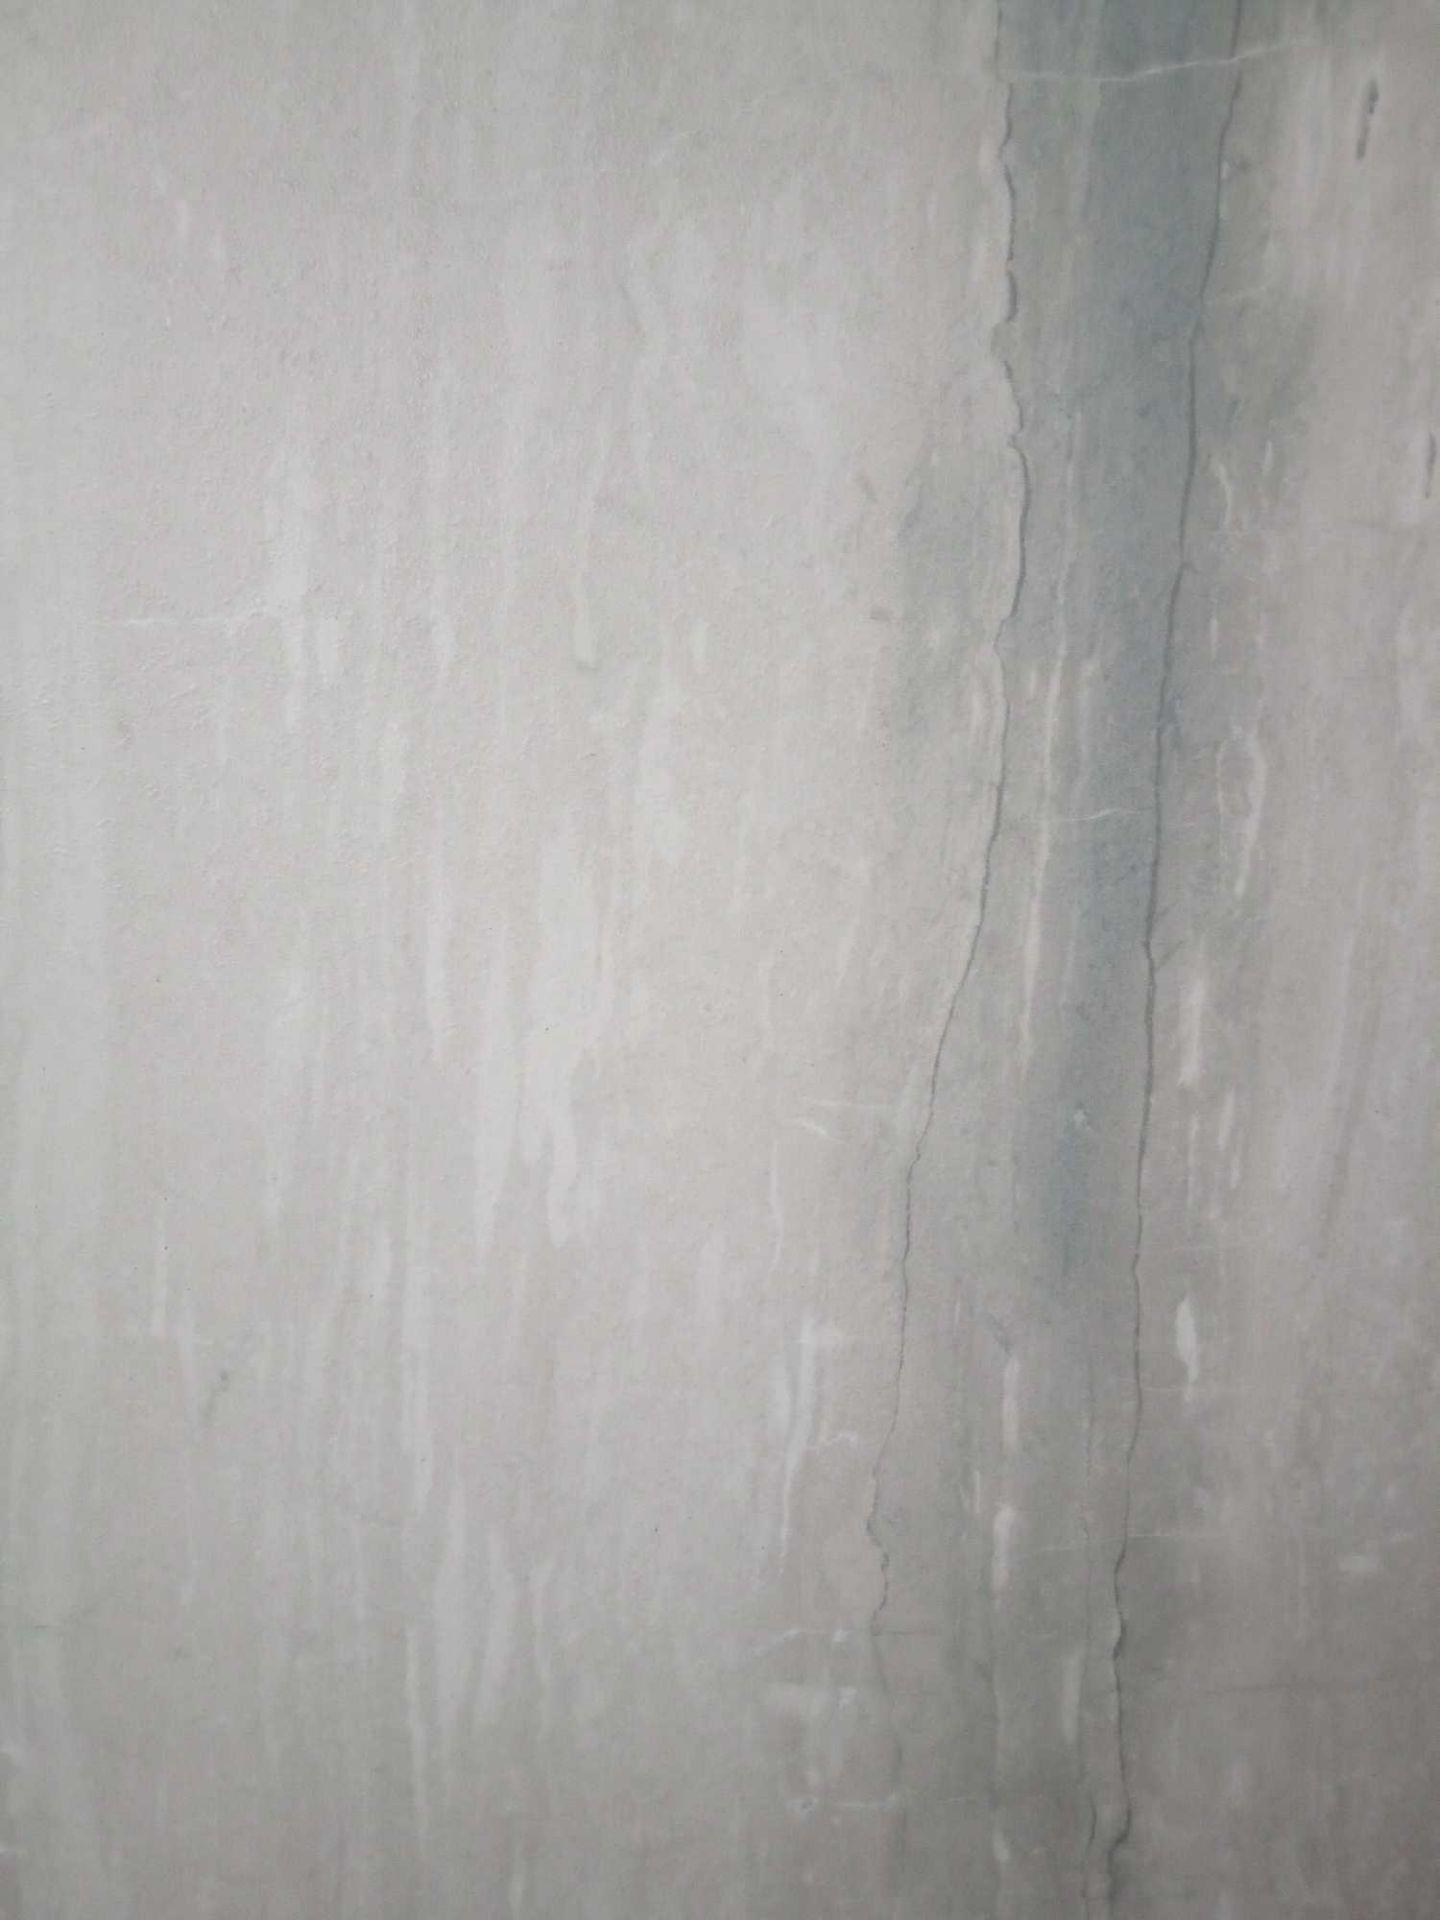 Combined RRP £1200 Pallet To Contain 40 Cartons Of Hardwick Beech Matt Texture 600X300Mm Wall/